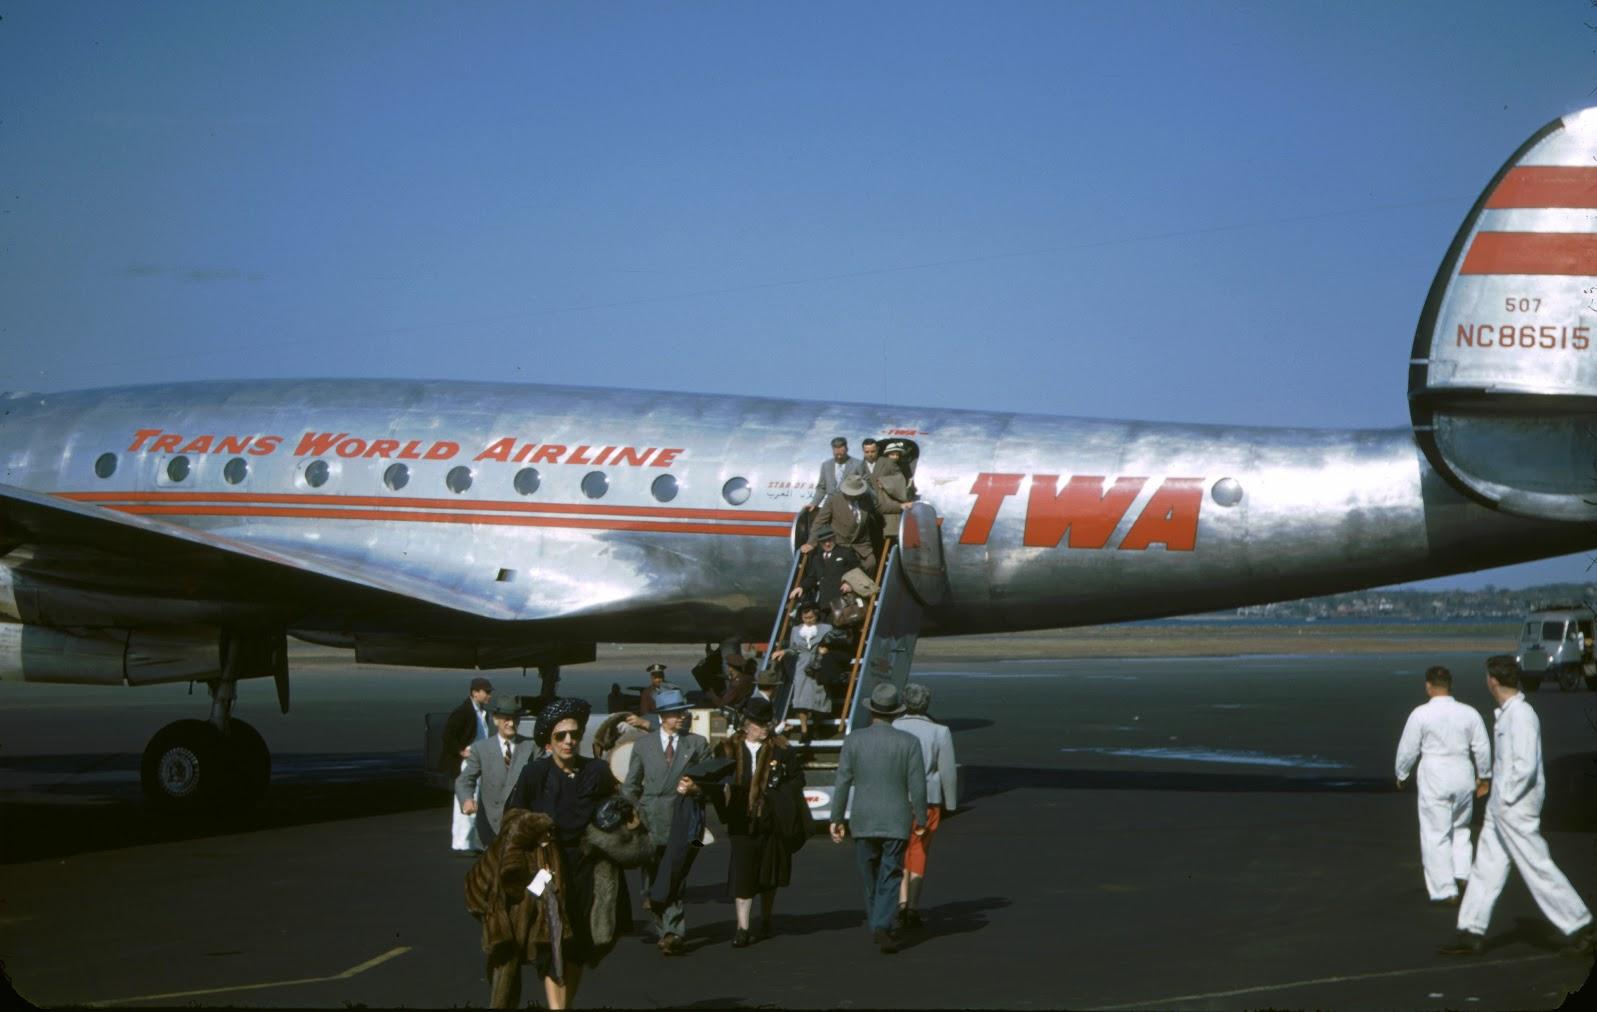 1948 NY Leaving plane at LaGuardia Field